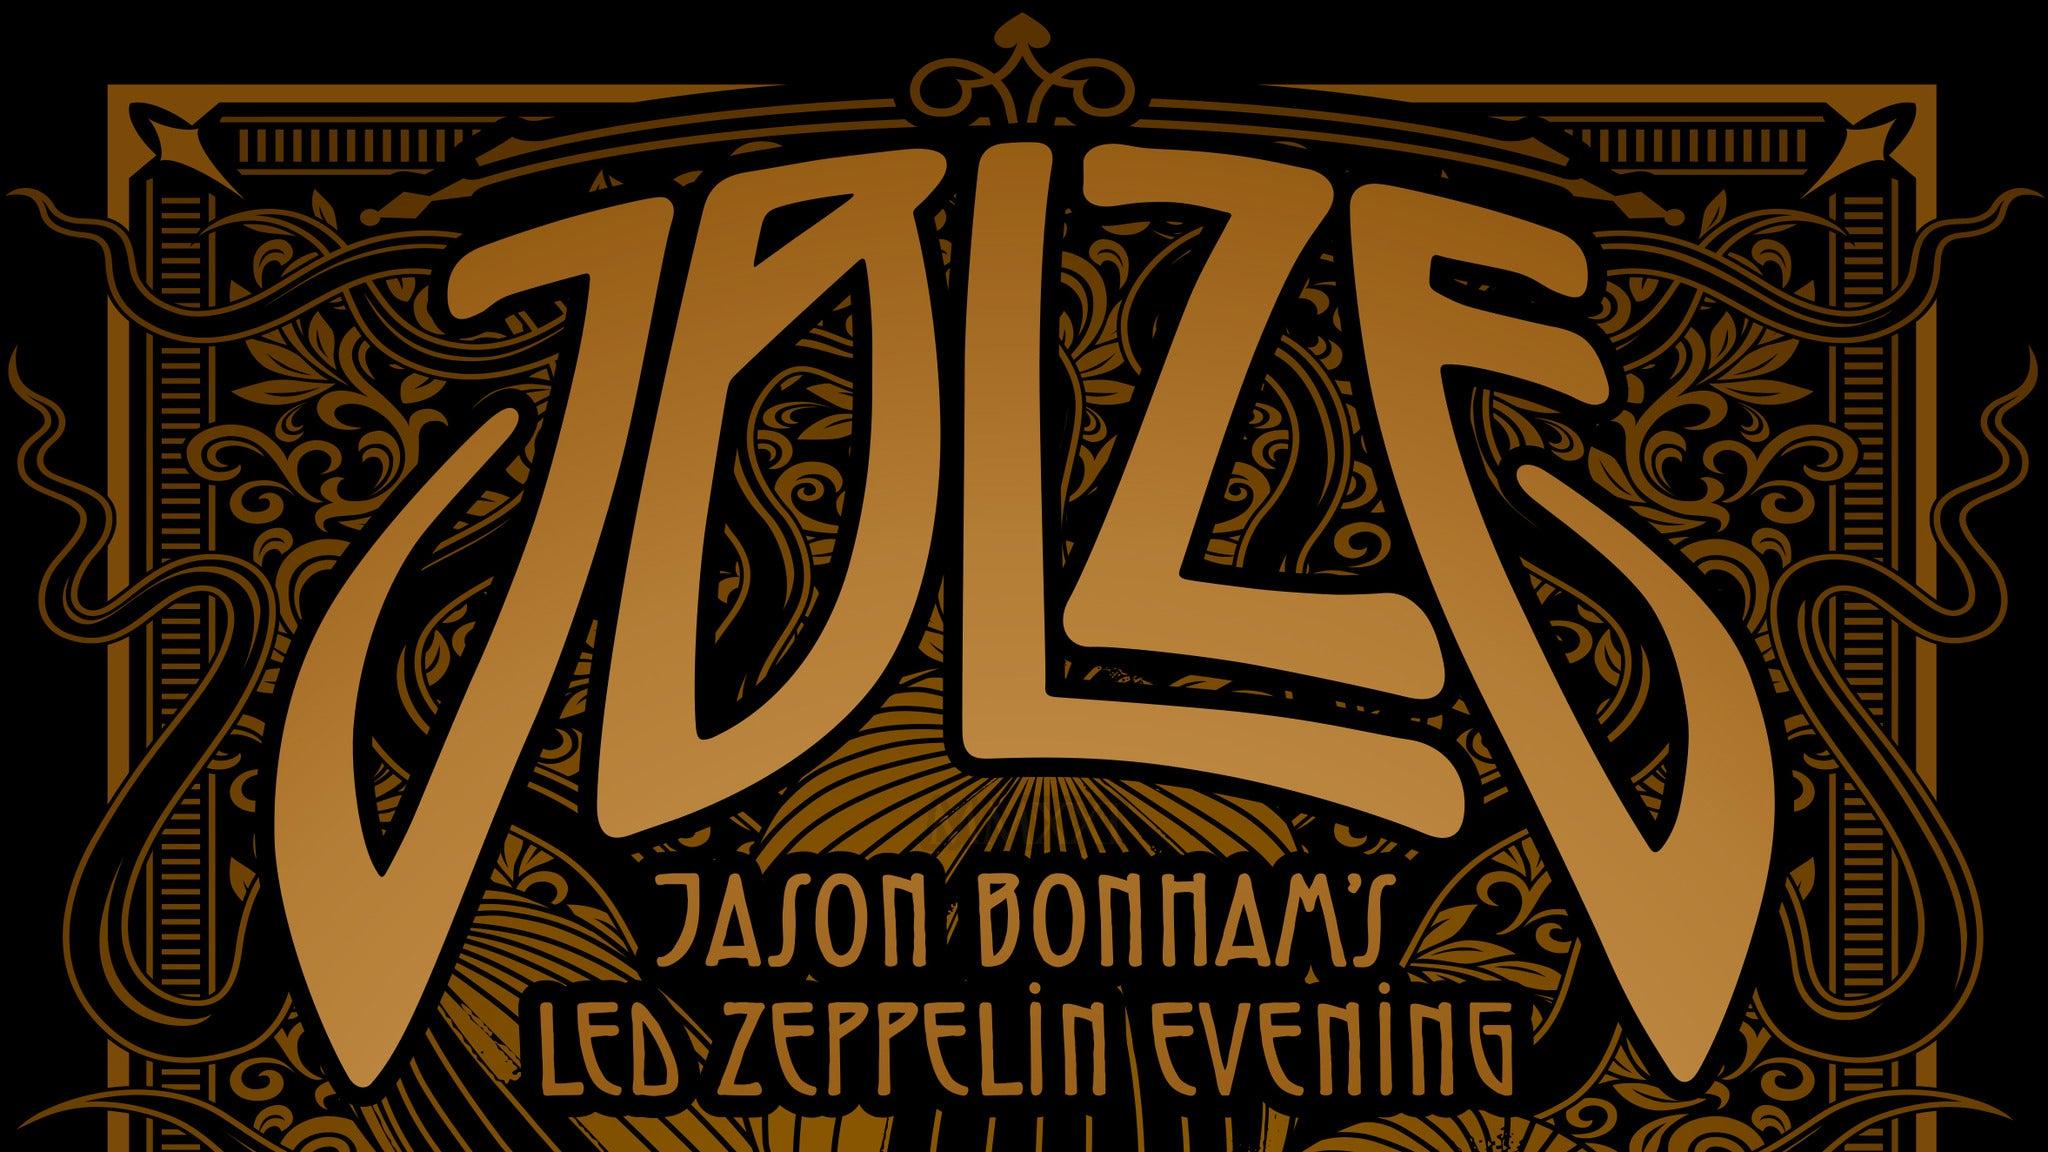 presale passcode for Jason Bonham's Led Zeppelin Experience tickets in Tucson - AZ (Tucson Music Hall)